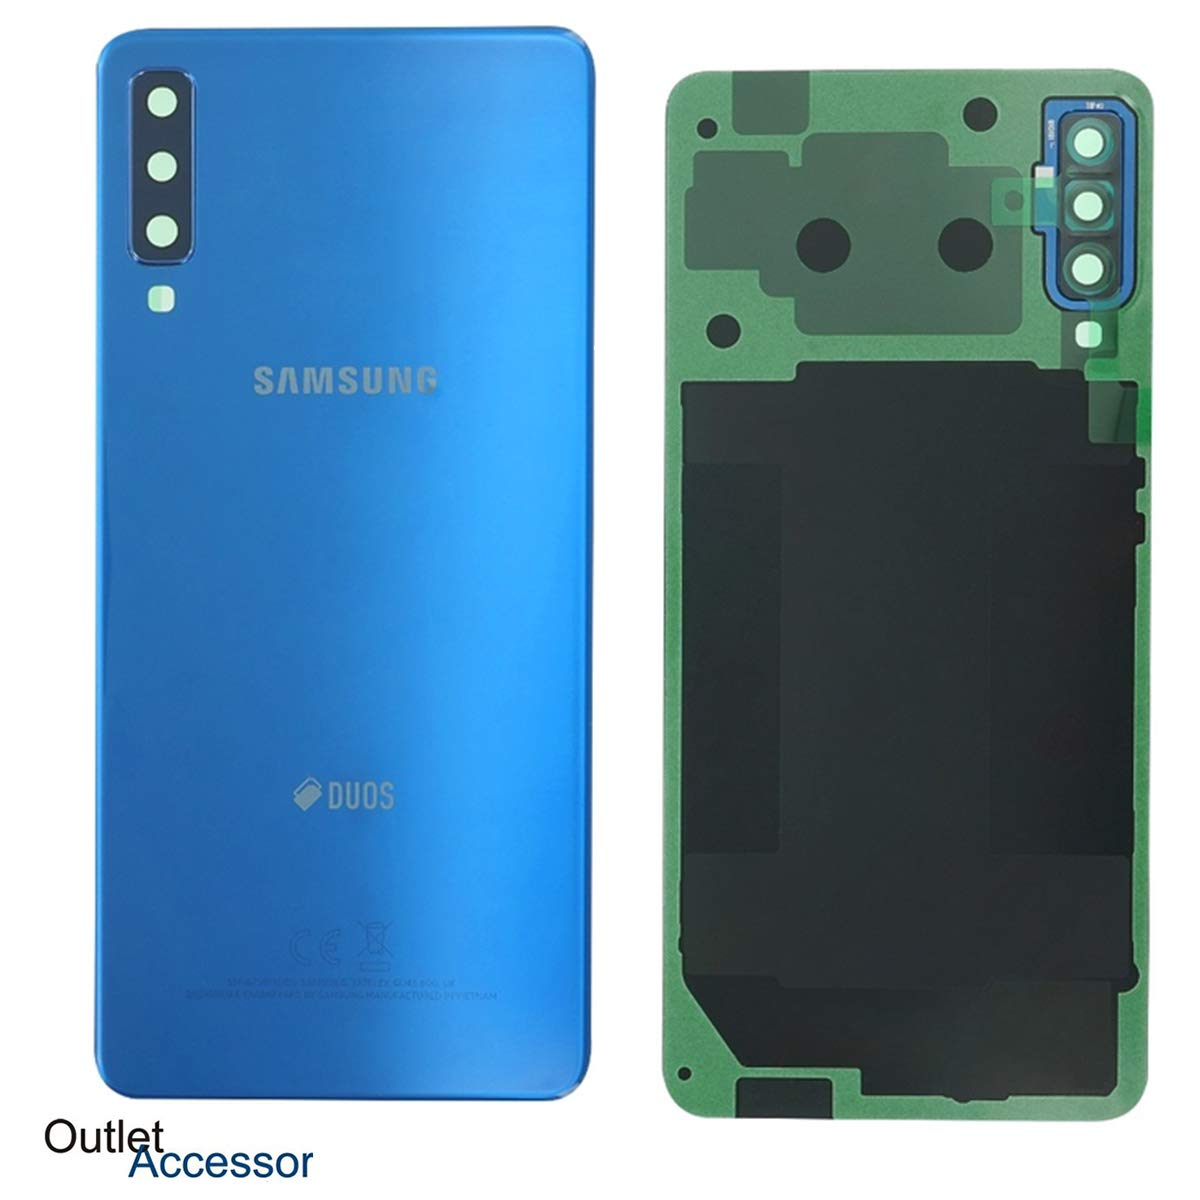 originale Tapa Trasera de Cristal Compatible con Samsung A7 2018 ...